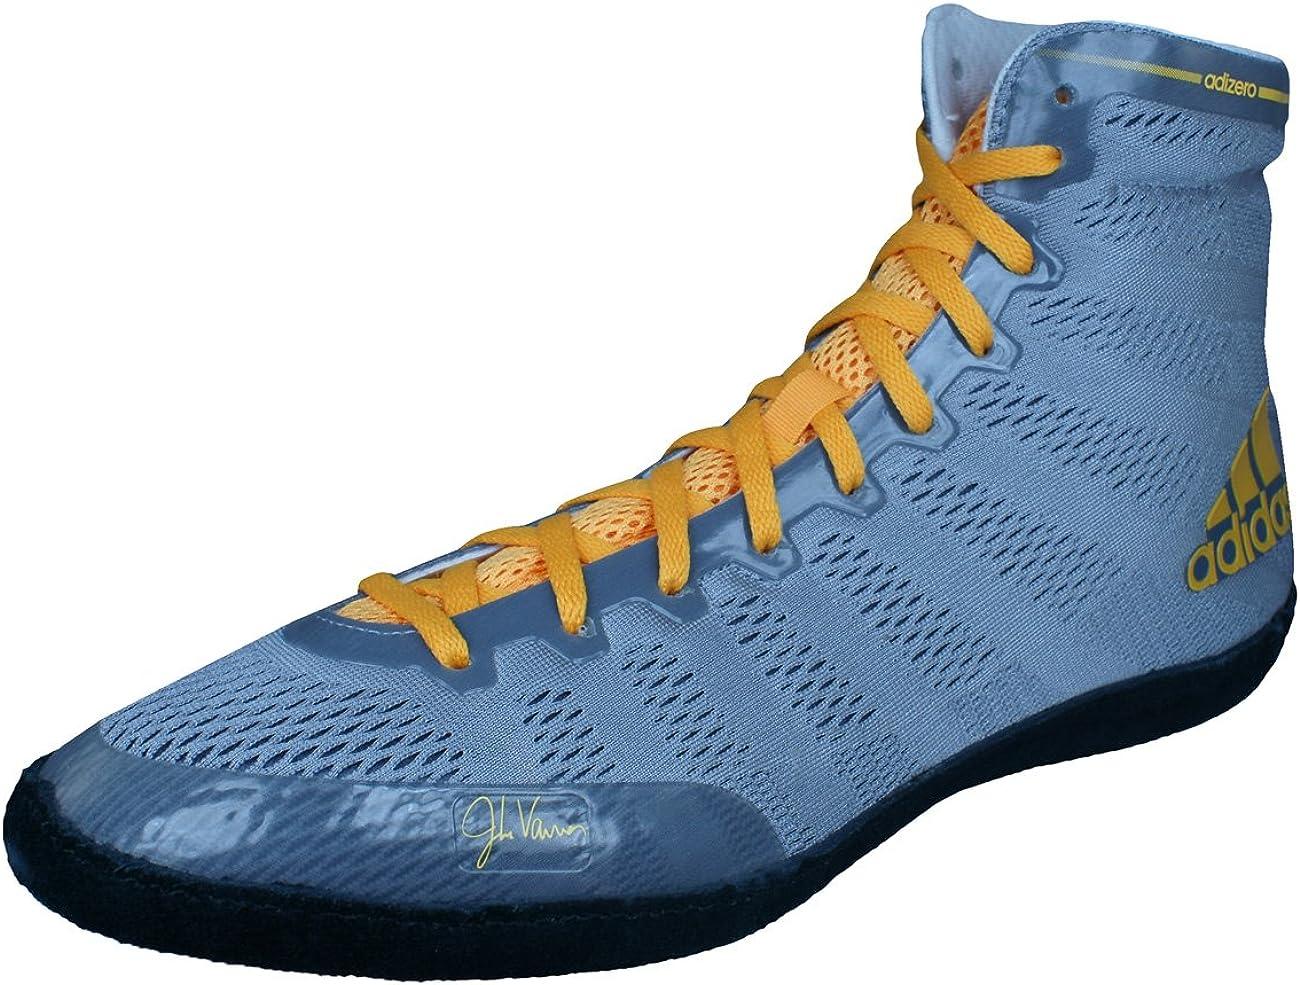 adidas Adizero Wrestling XIV Mens Wrestling Shoes/Sneakers